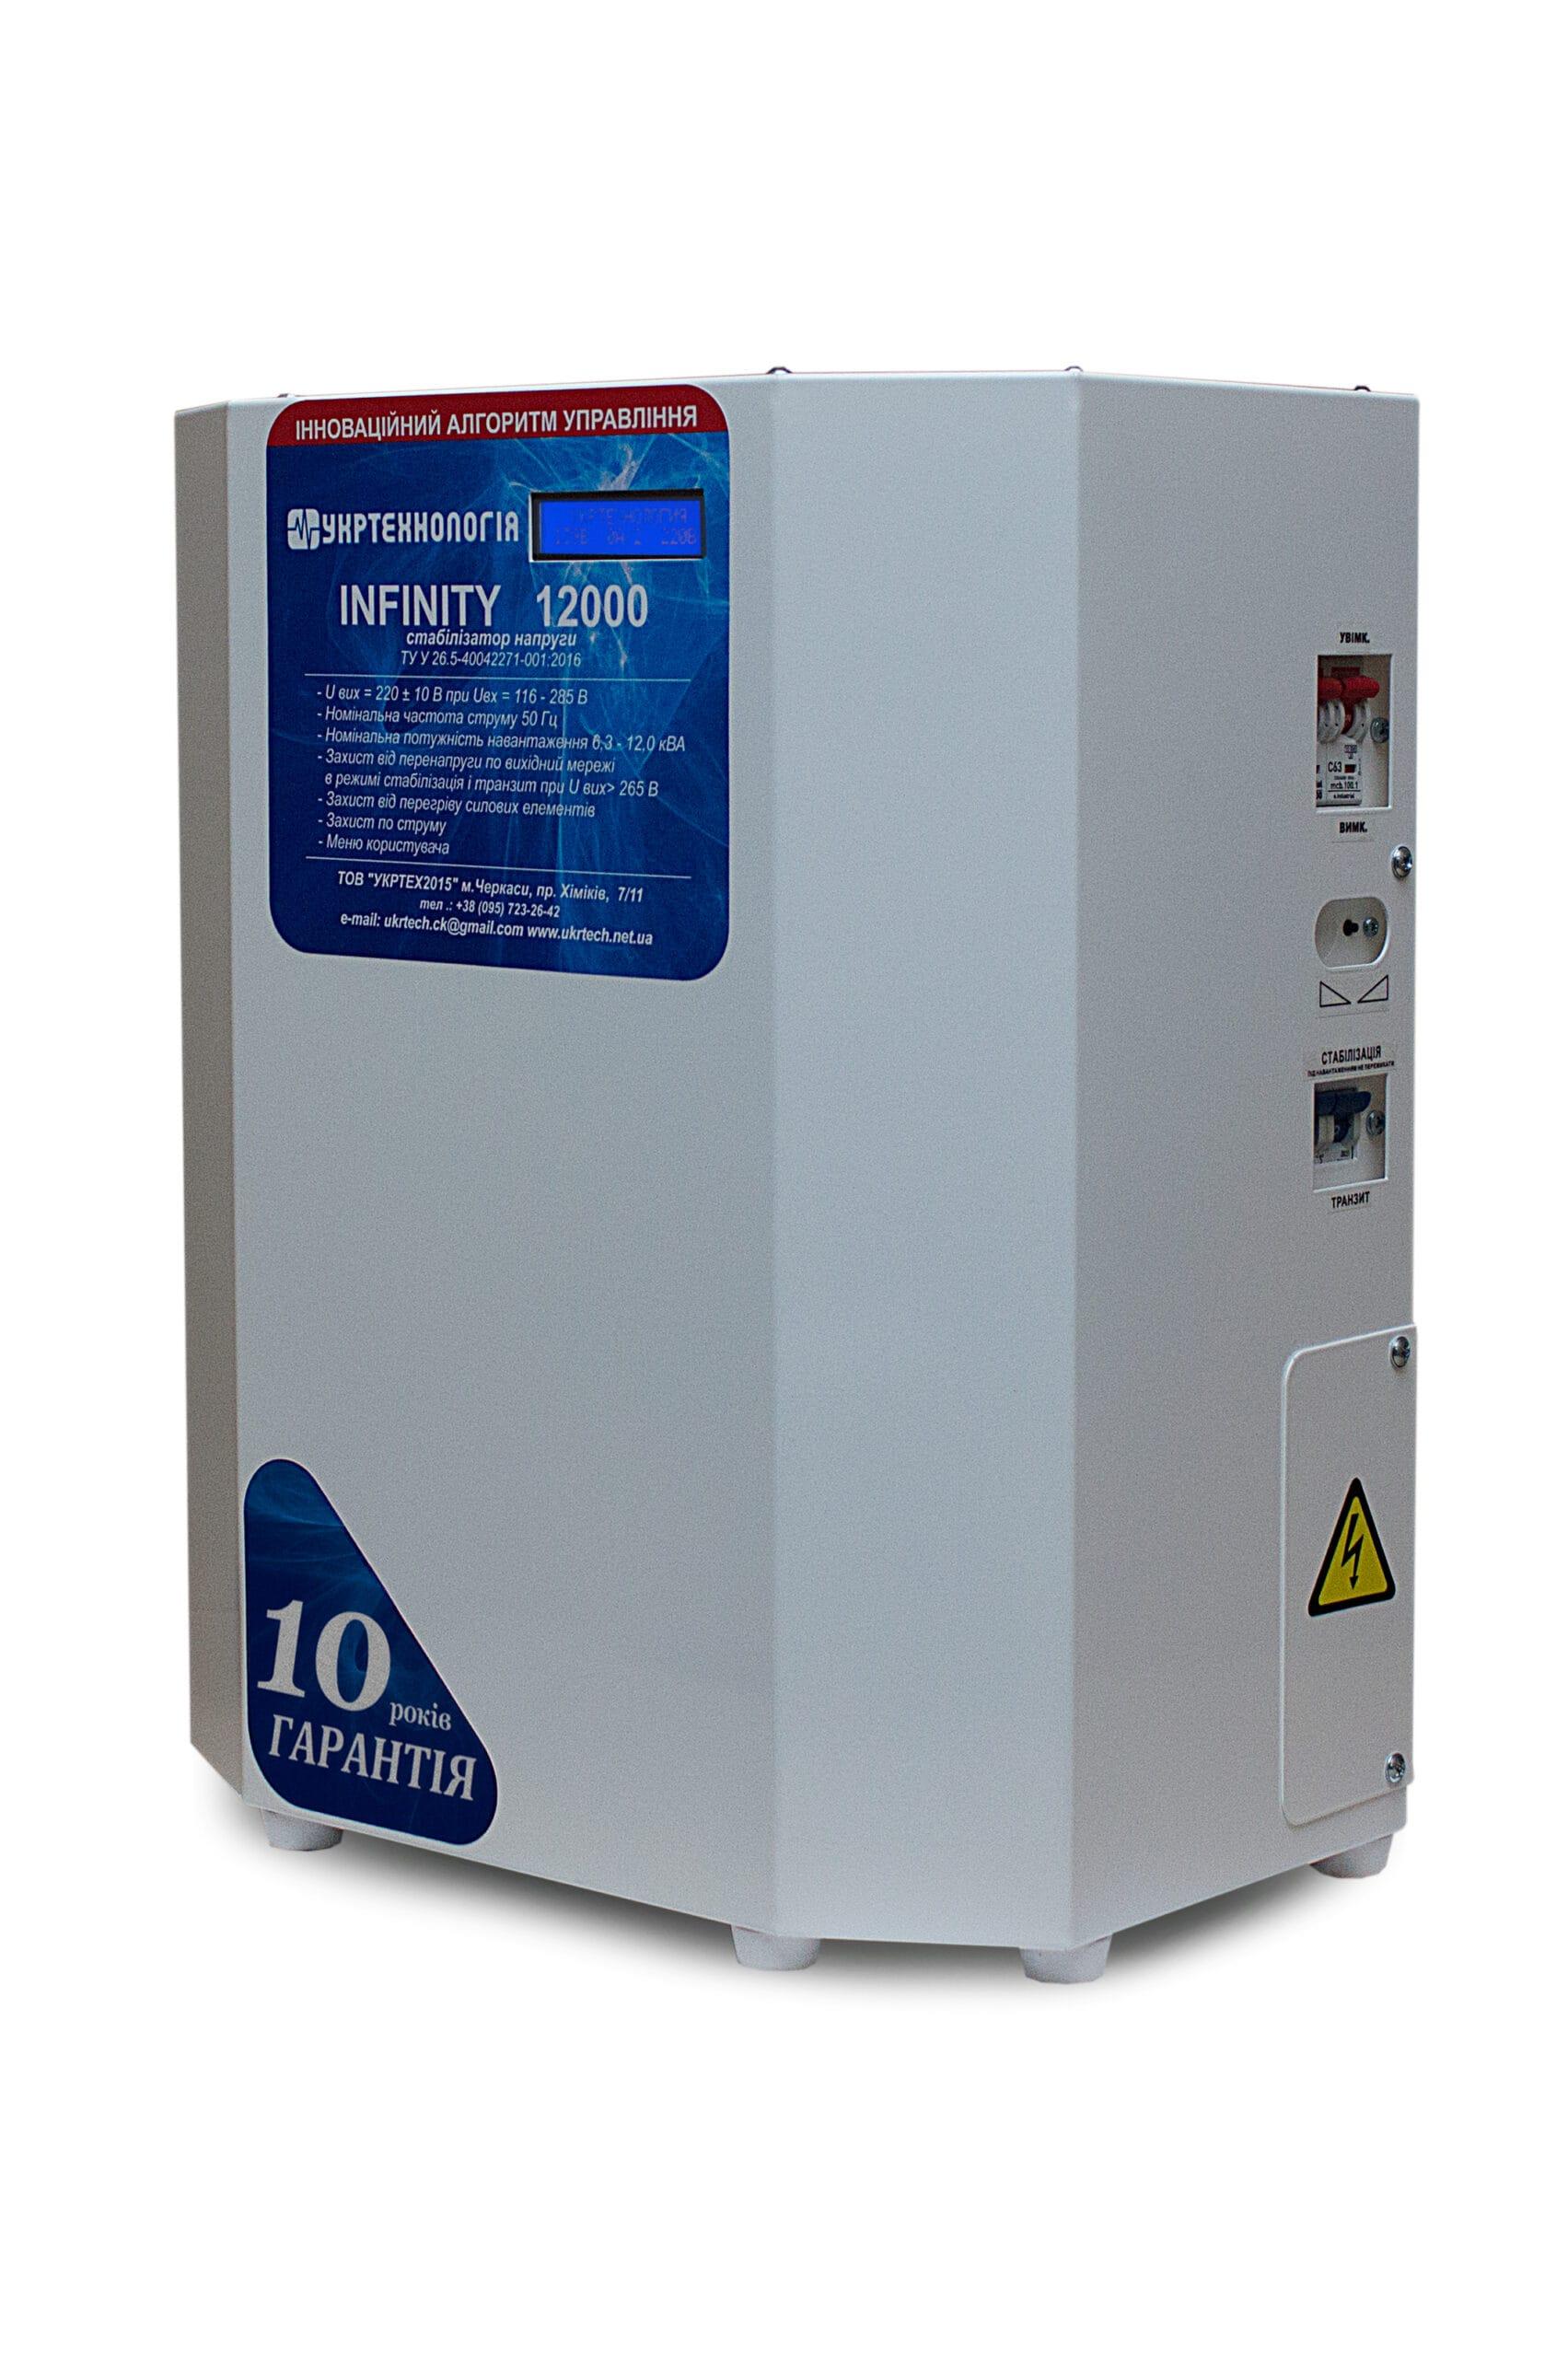 Стабилизаторы напряжения - Стабилизатор напряжения 12 кВт INFINITY 000001413 - Фото 2